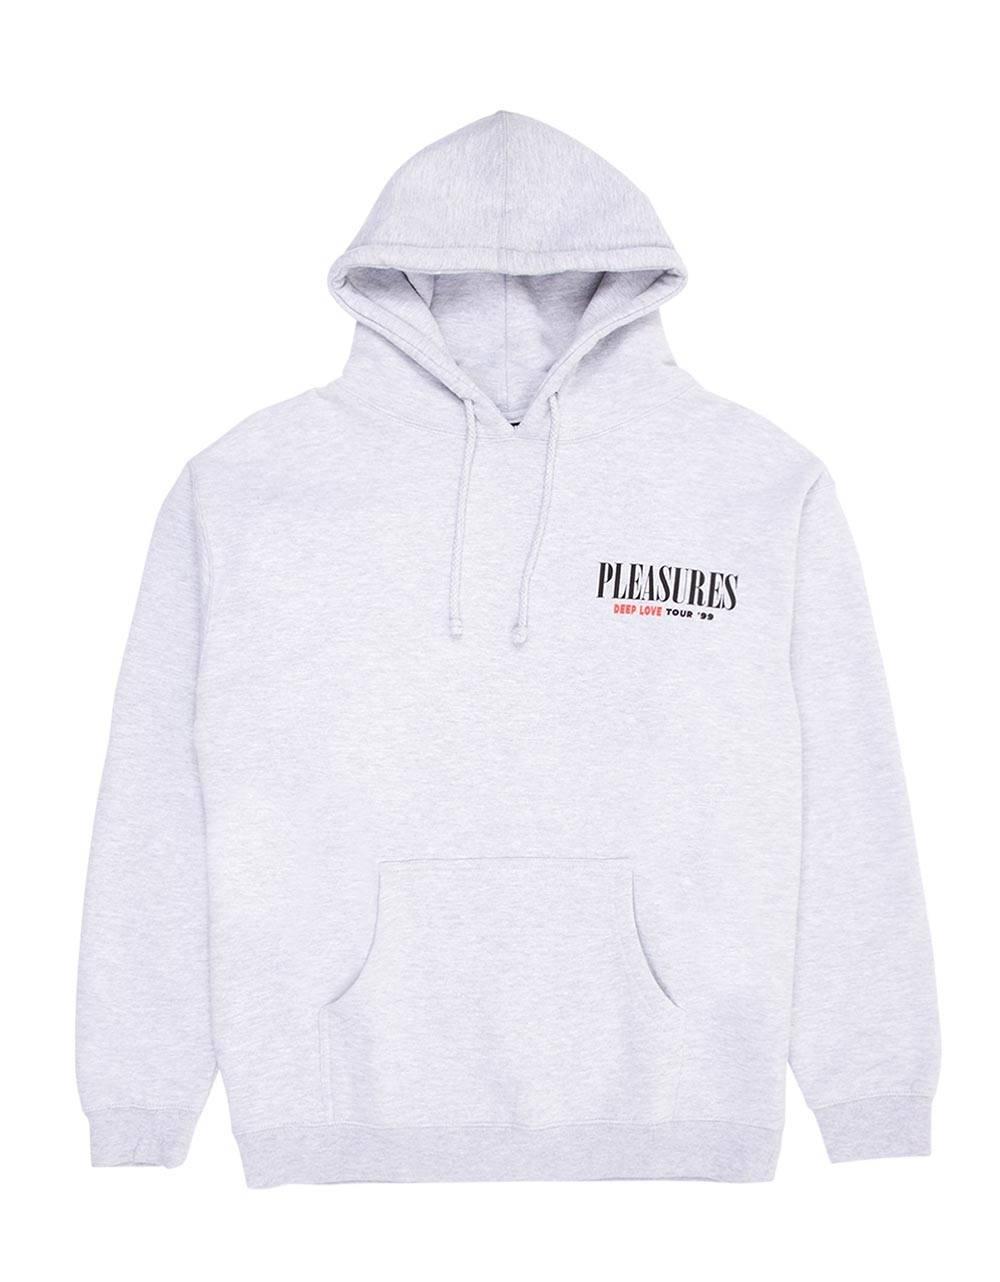 Pleasures Deep love hoodie - heather grey Pleasures Sweater 125,00€